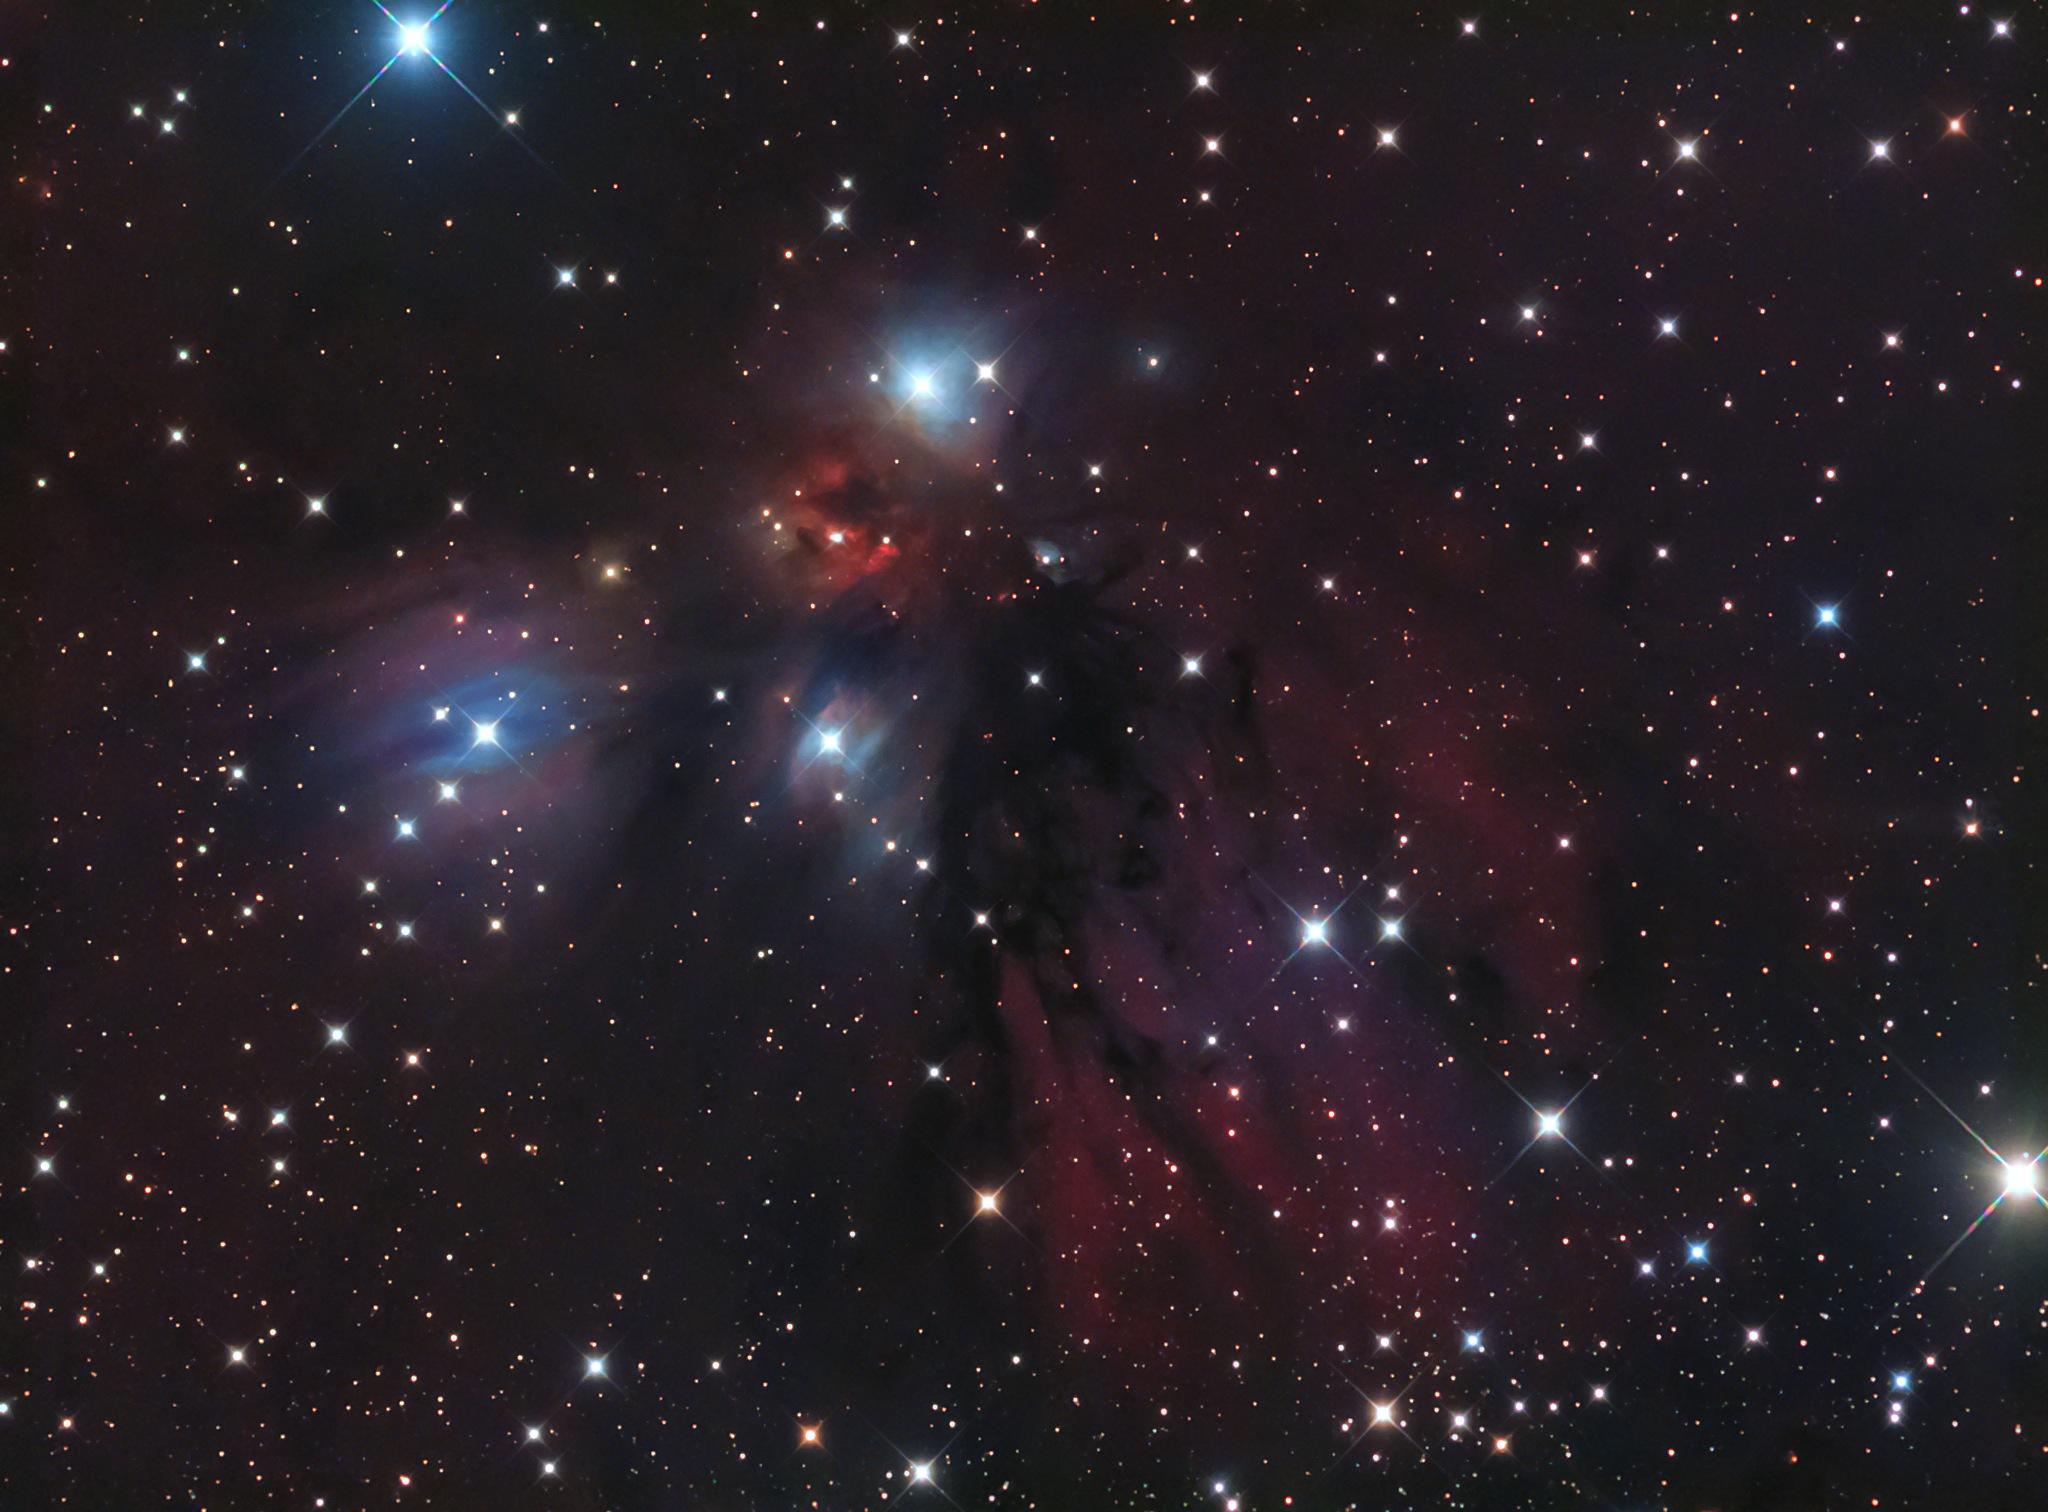 NGC 2170 by Tragoolchitr Jittasaiyapan